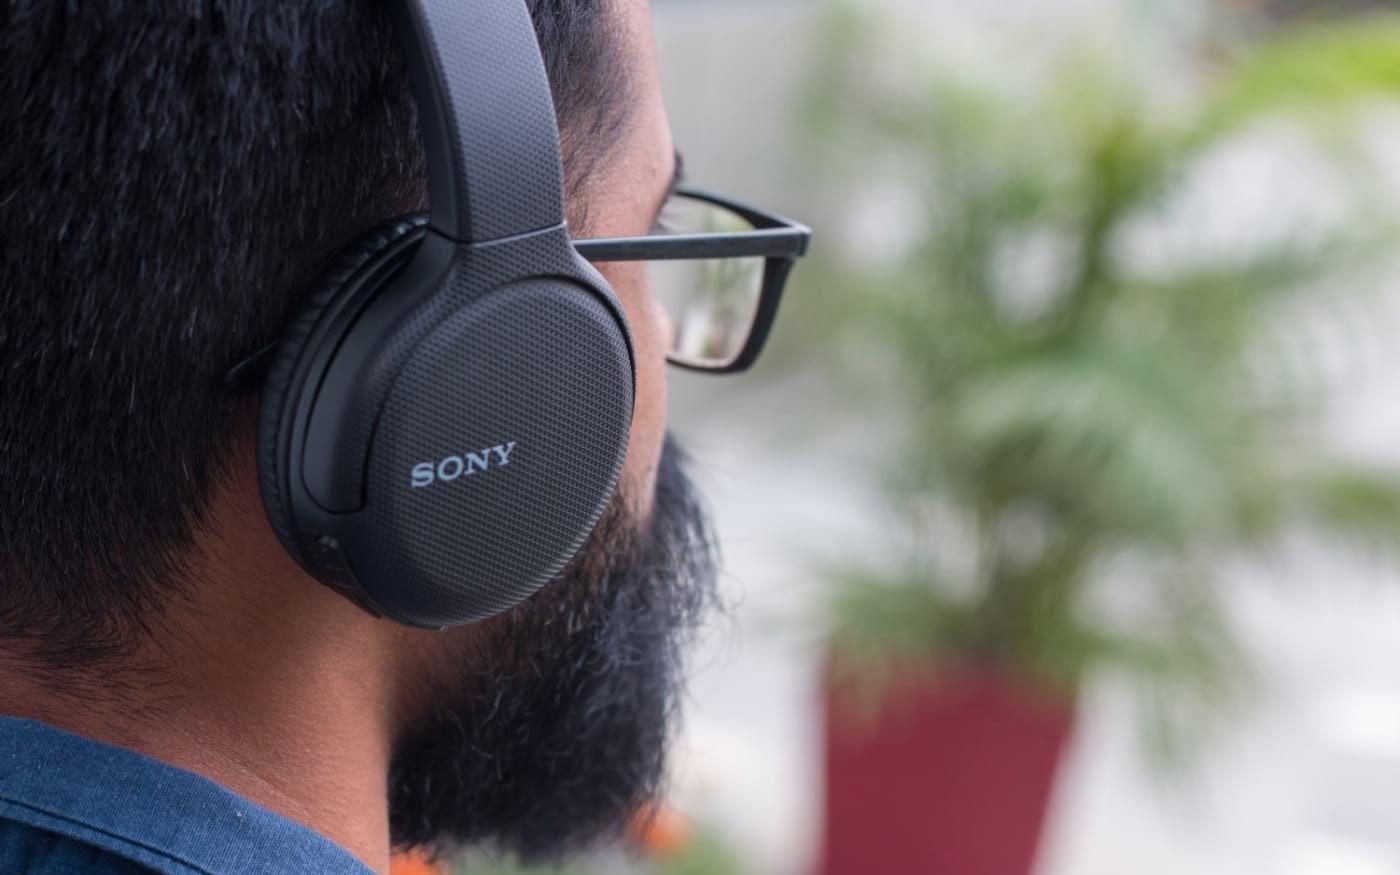 Fone de ouvido Bluetooth Sony WH-CH510